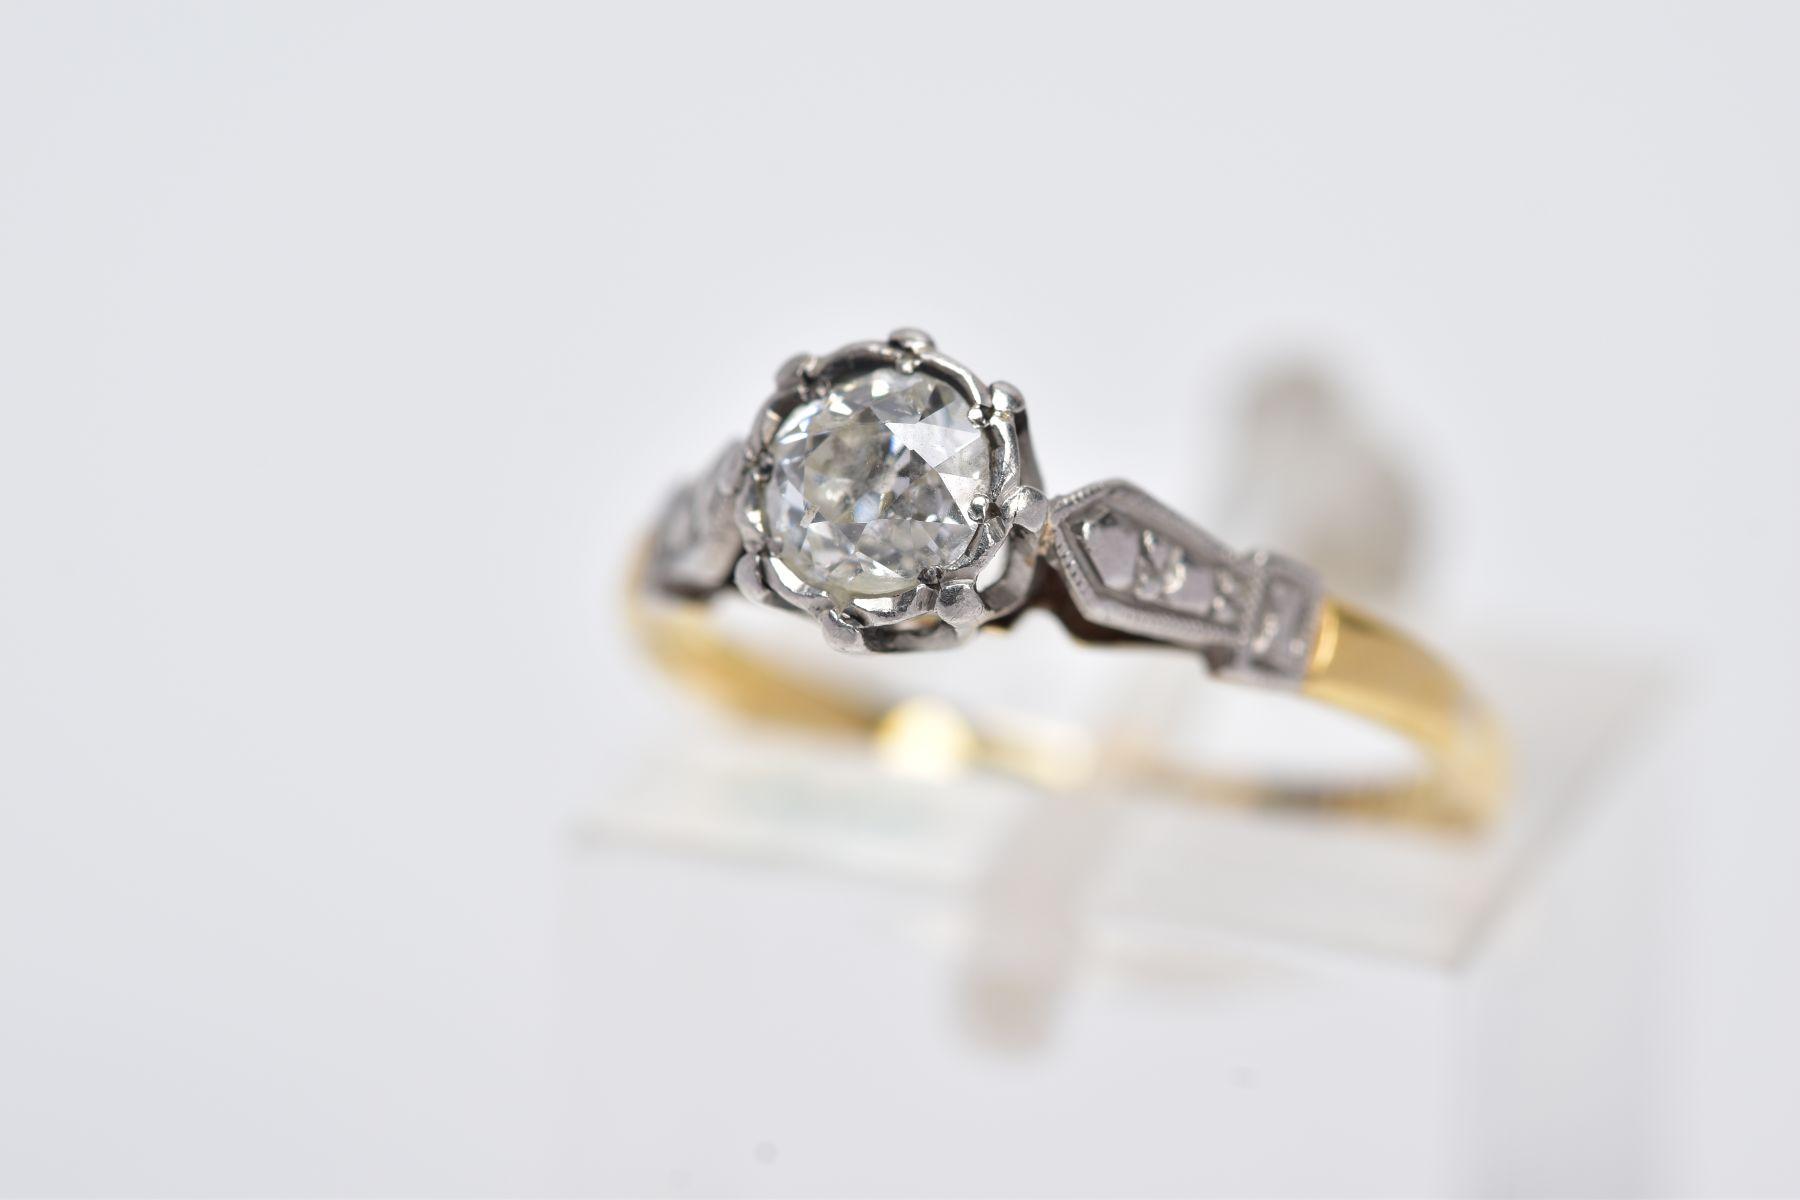 A YELLOW METAL SINGLE STONE DIAMOND RING, collet set, old cut diamonds, total estimated diamond